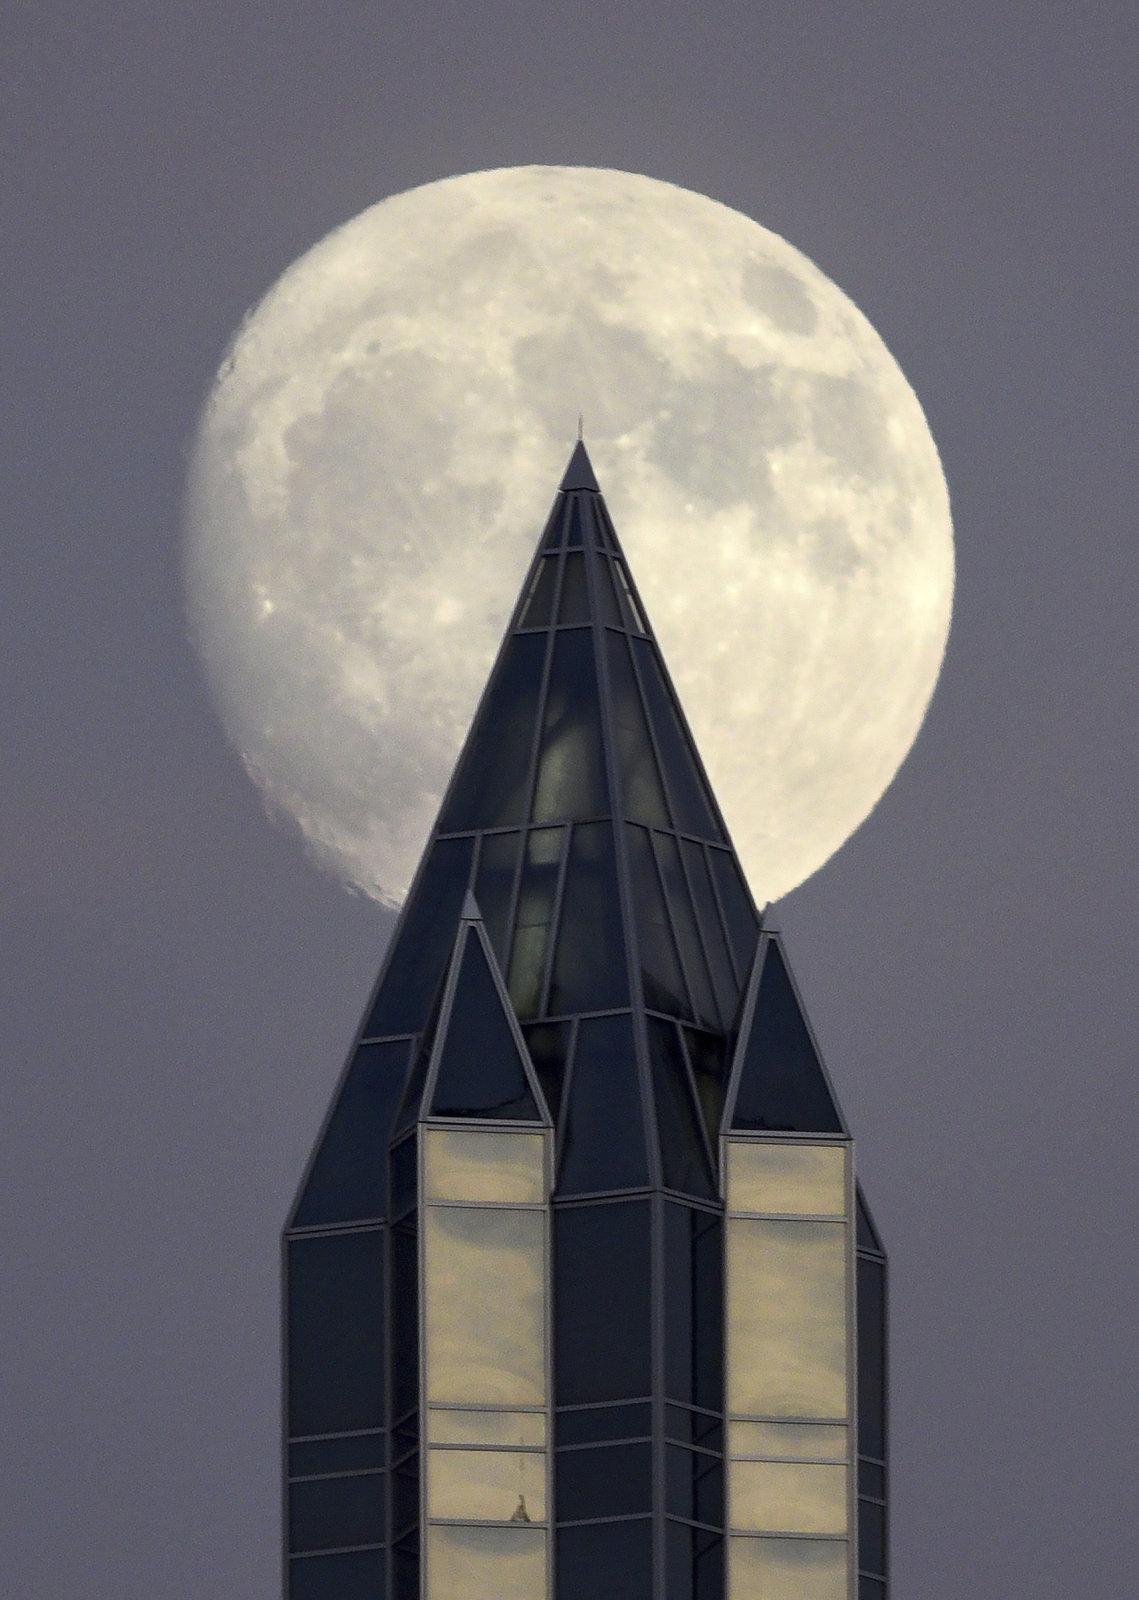 Měsíc napíchnutý na věži v Pittsburghu.